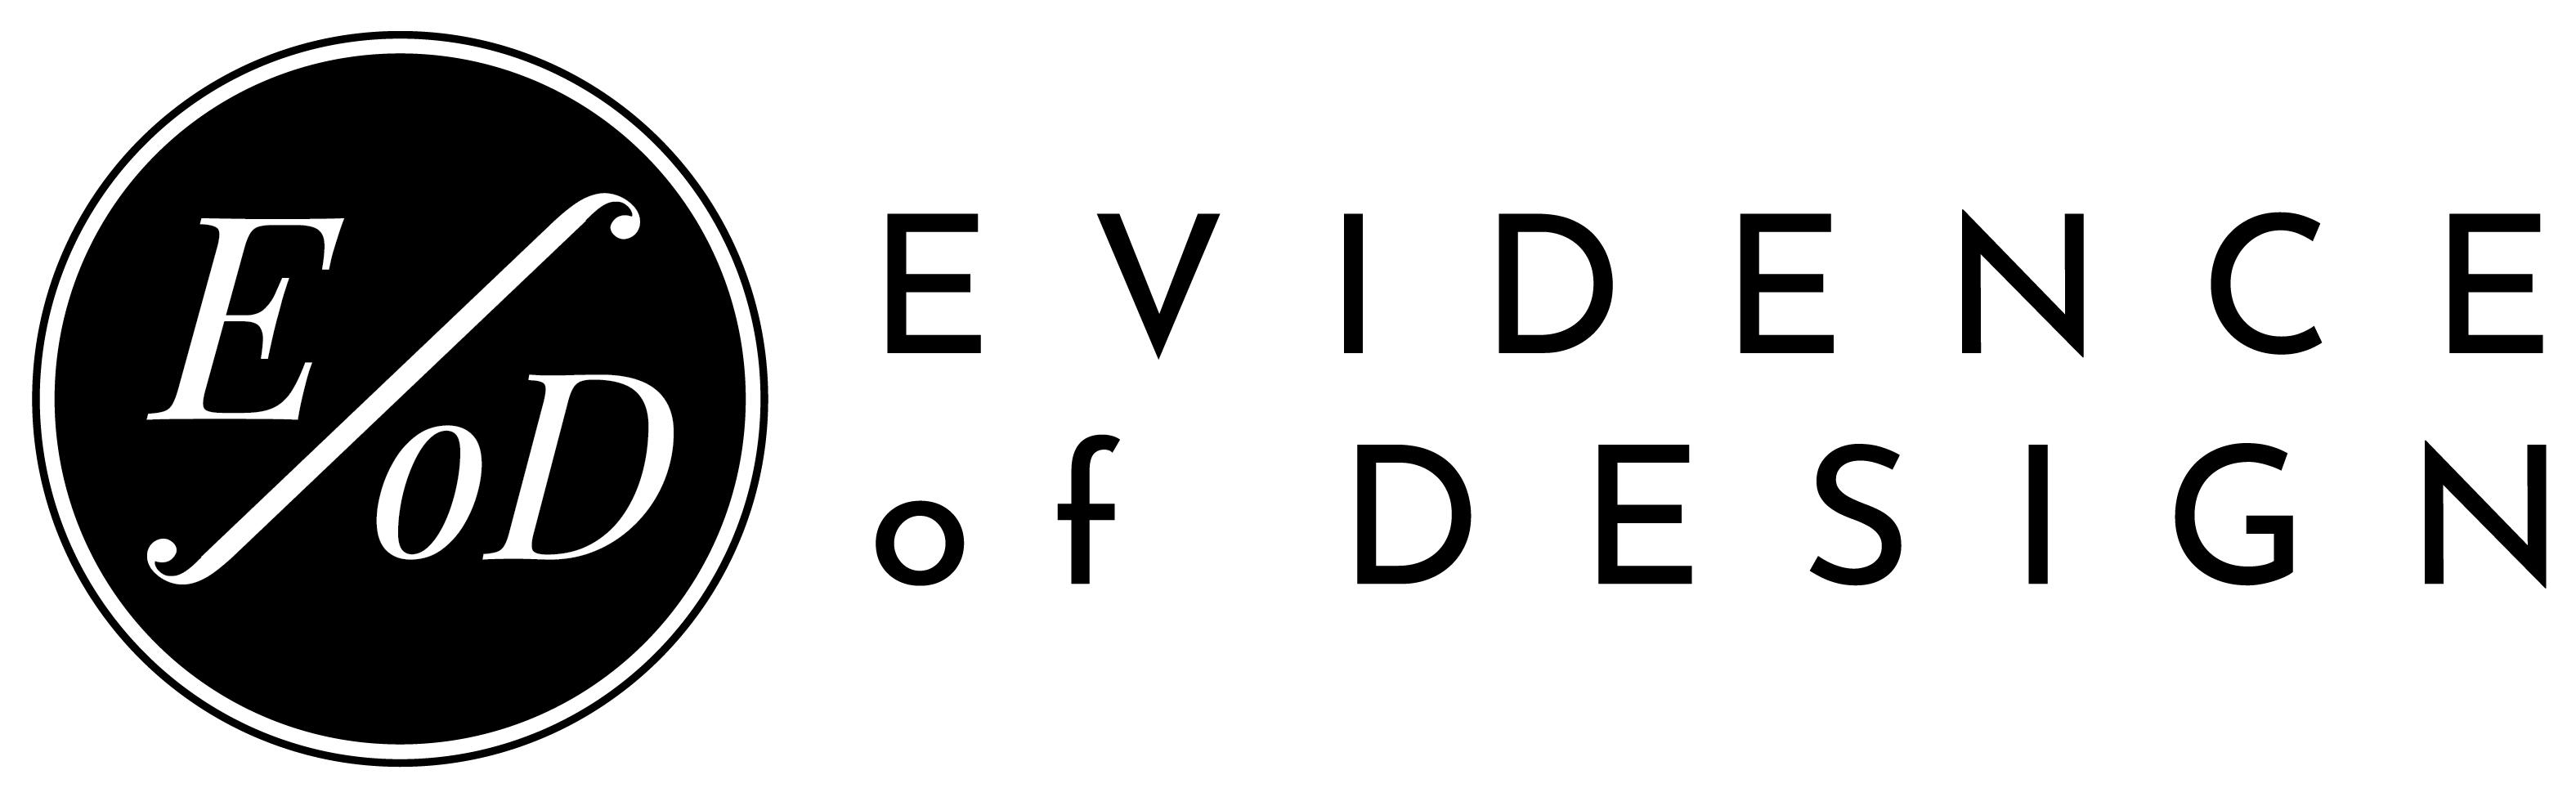 Evidence of Design